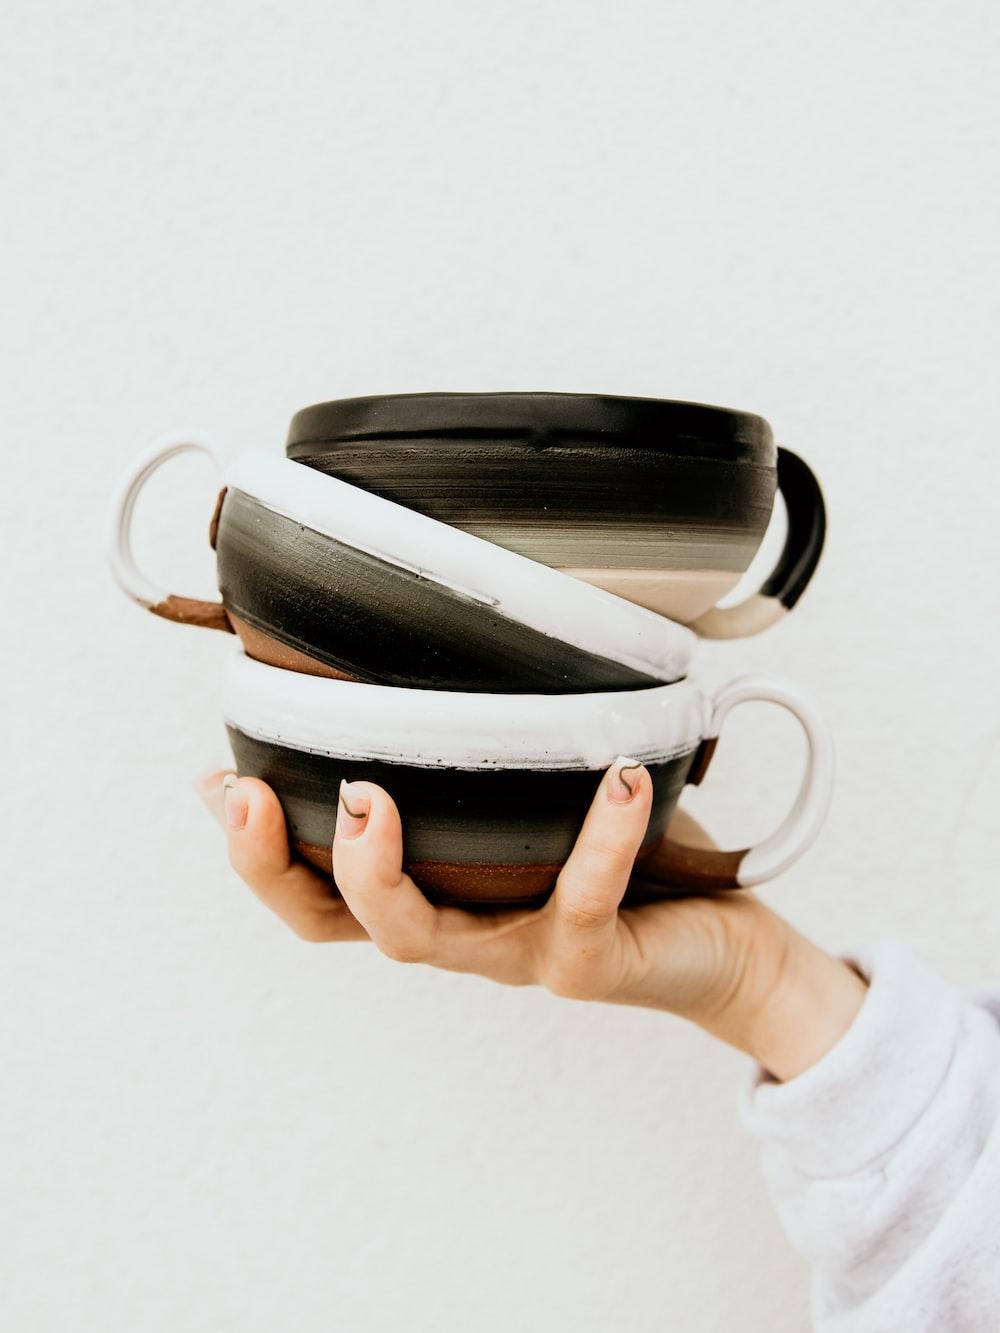 person holding black and white ceramic mug